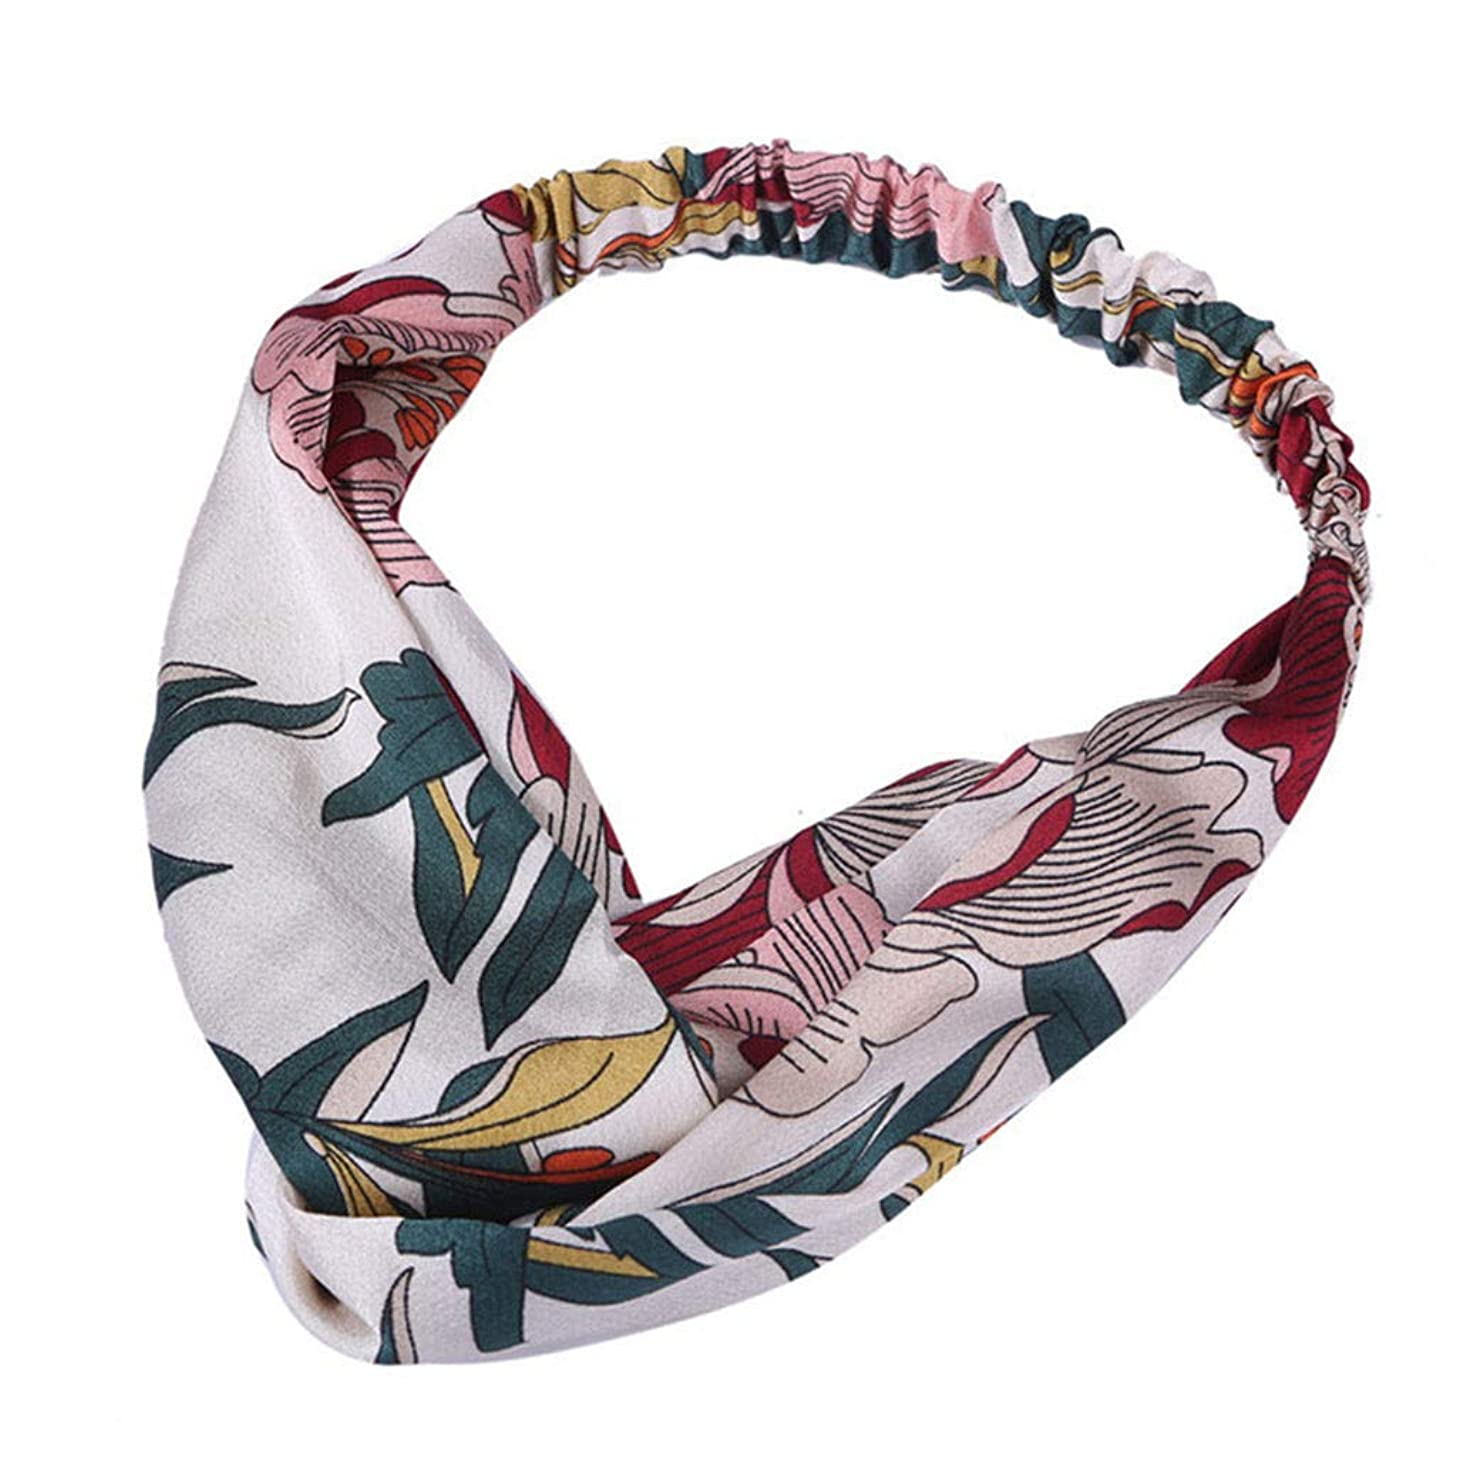 BEAUTYVAN Headbands for Women Floral Printed Head Wrap Twisted Cute Hair Accessories Elastic Turban Knot Hair Band